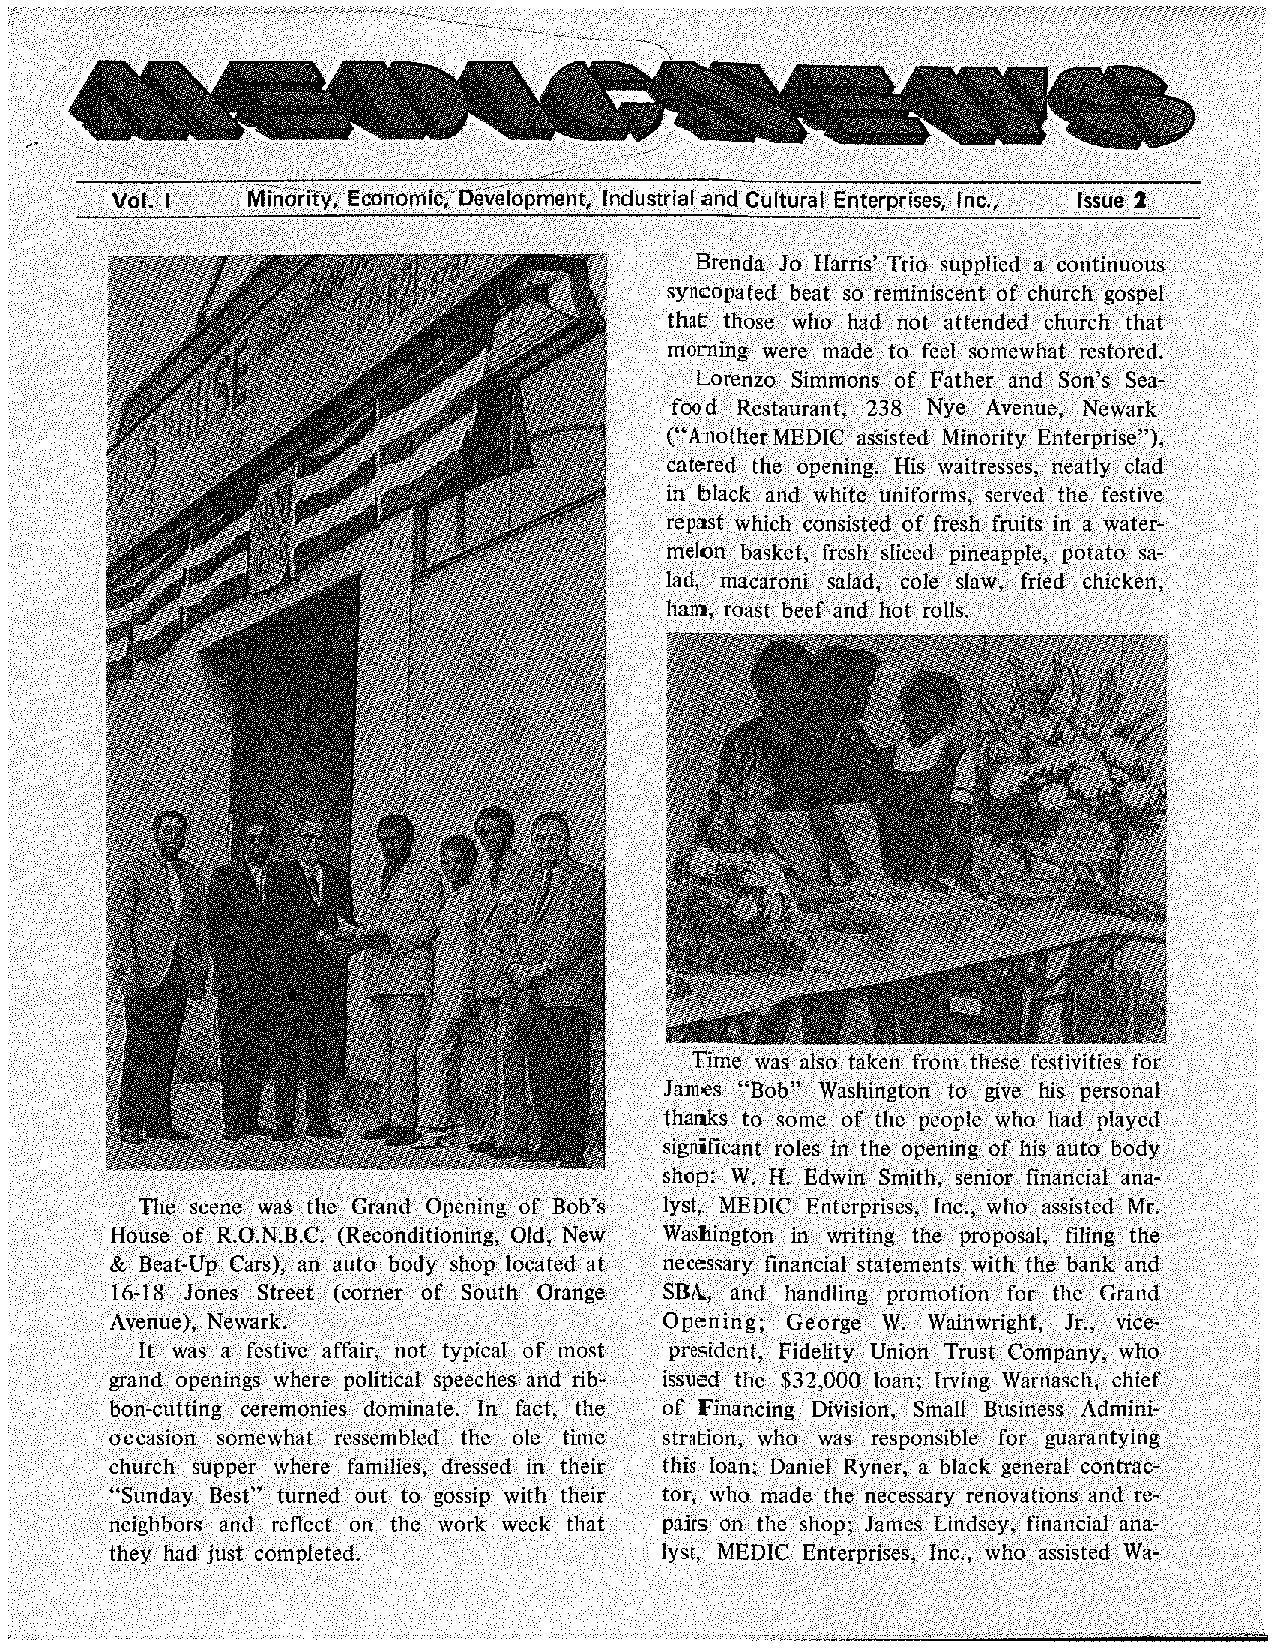 MEDIC News (1971)